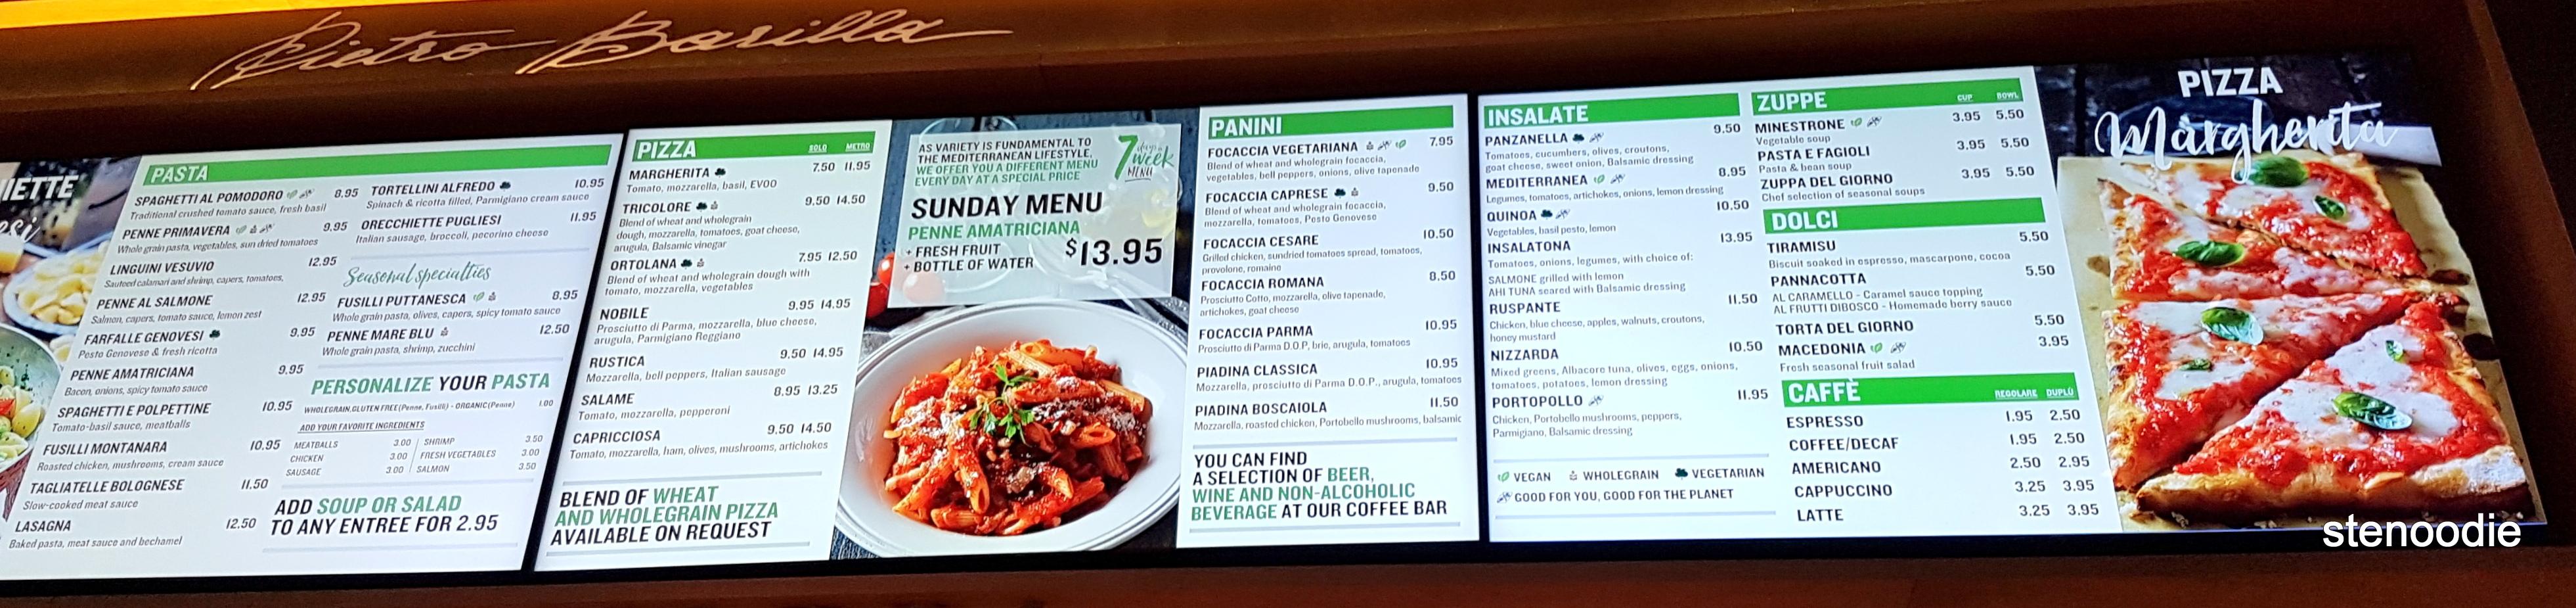 Barilla Restaurants menu and prices